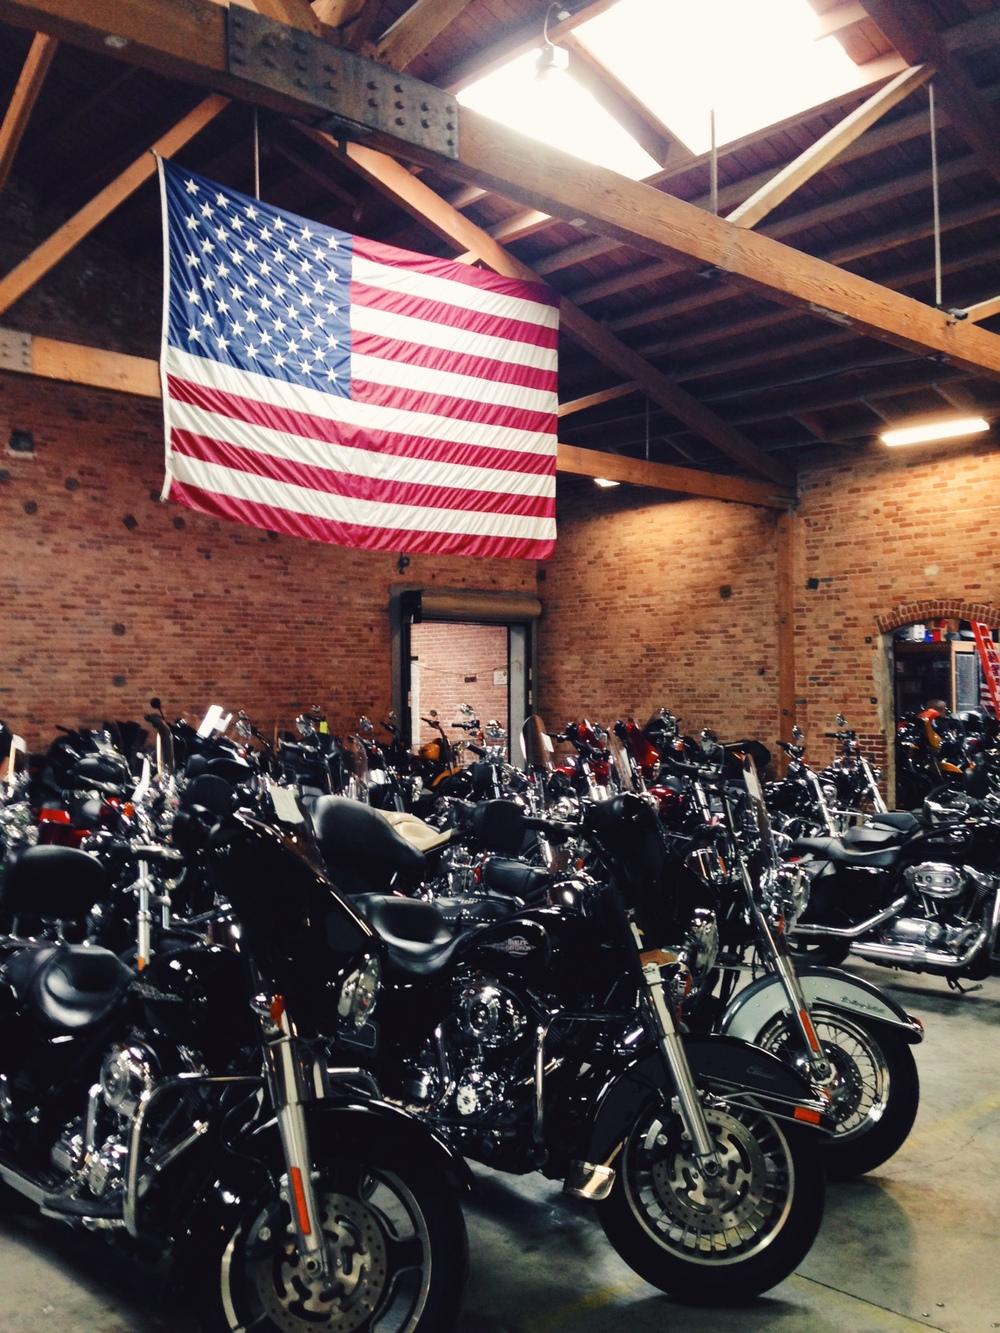 Eagle Rider: bike rental joint